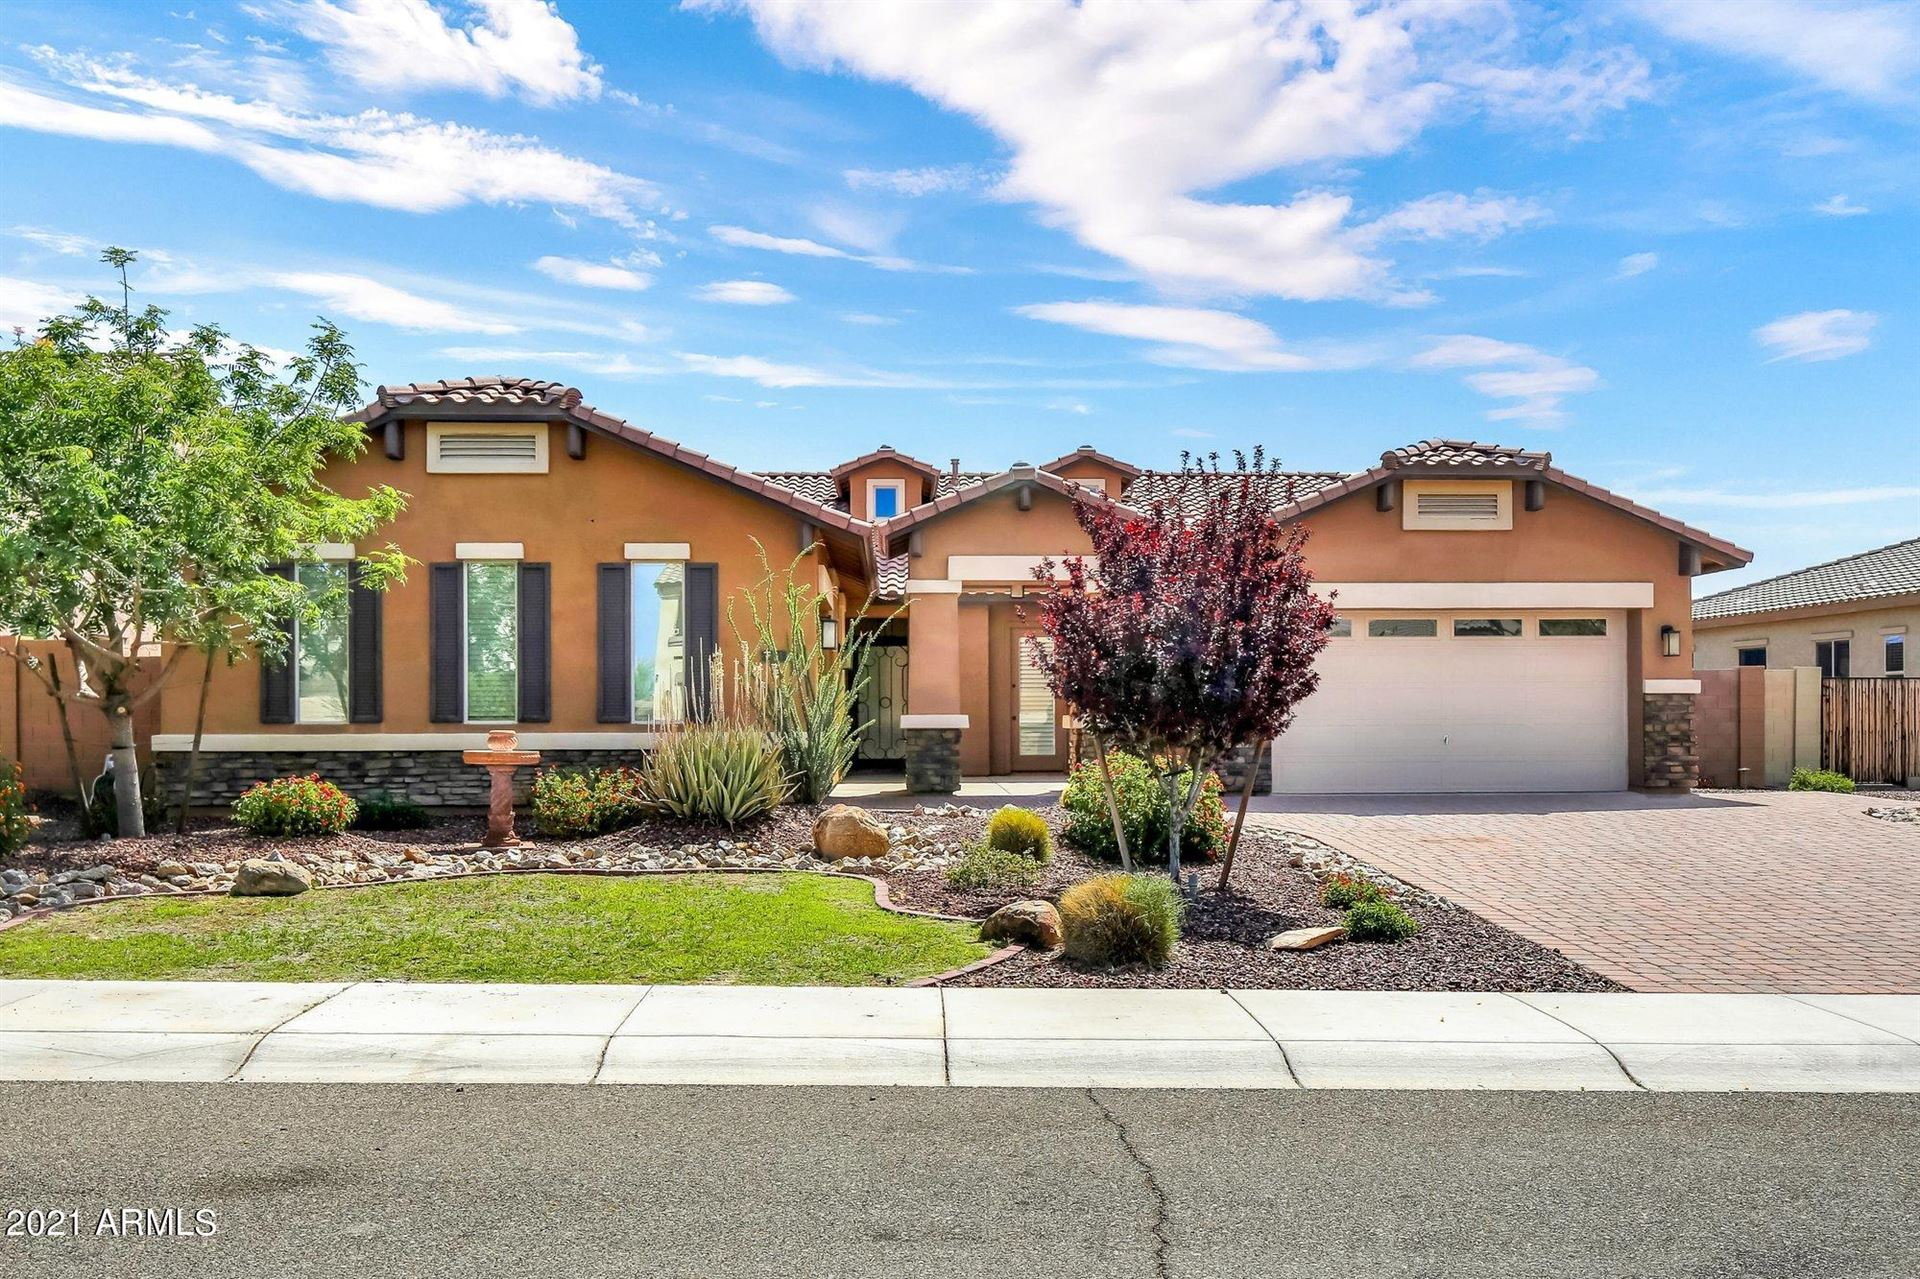 31605 N 47TH Terrace, Cave Creek, AZ 85331 - MLS#: 6229026